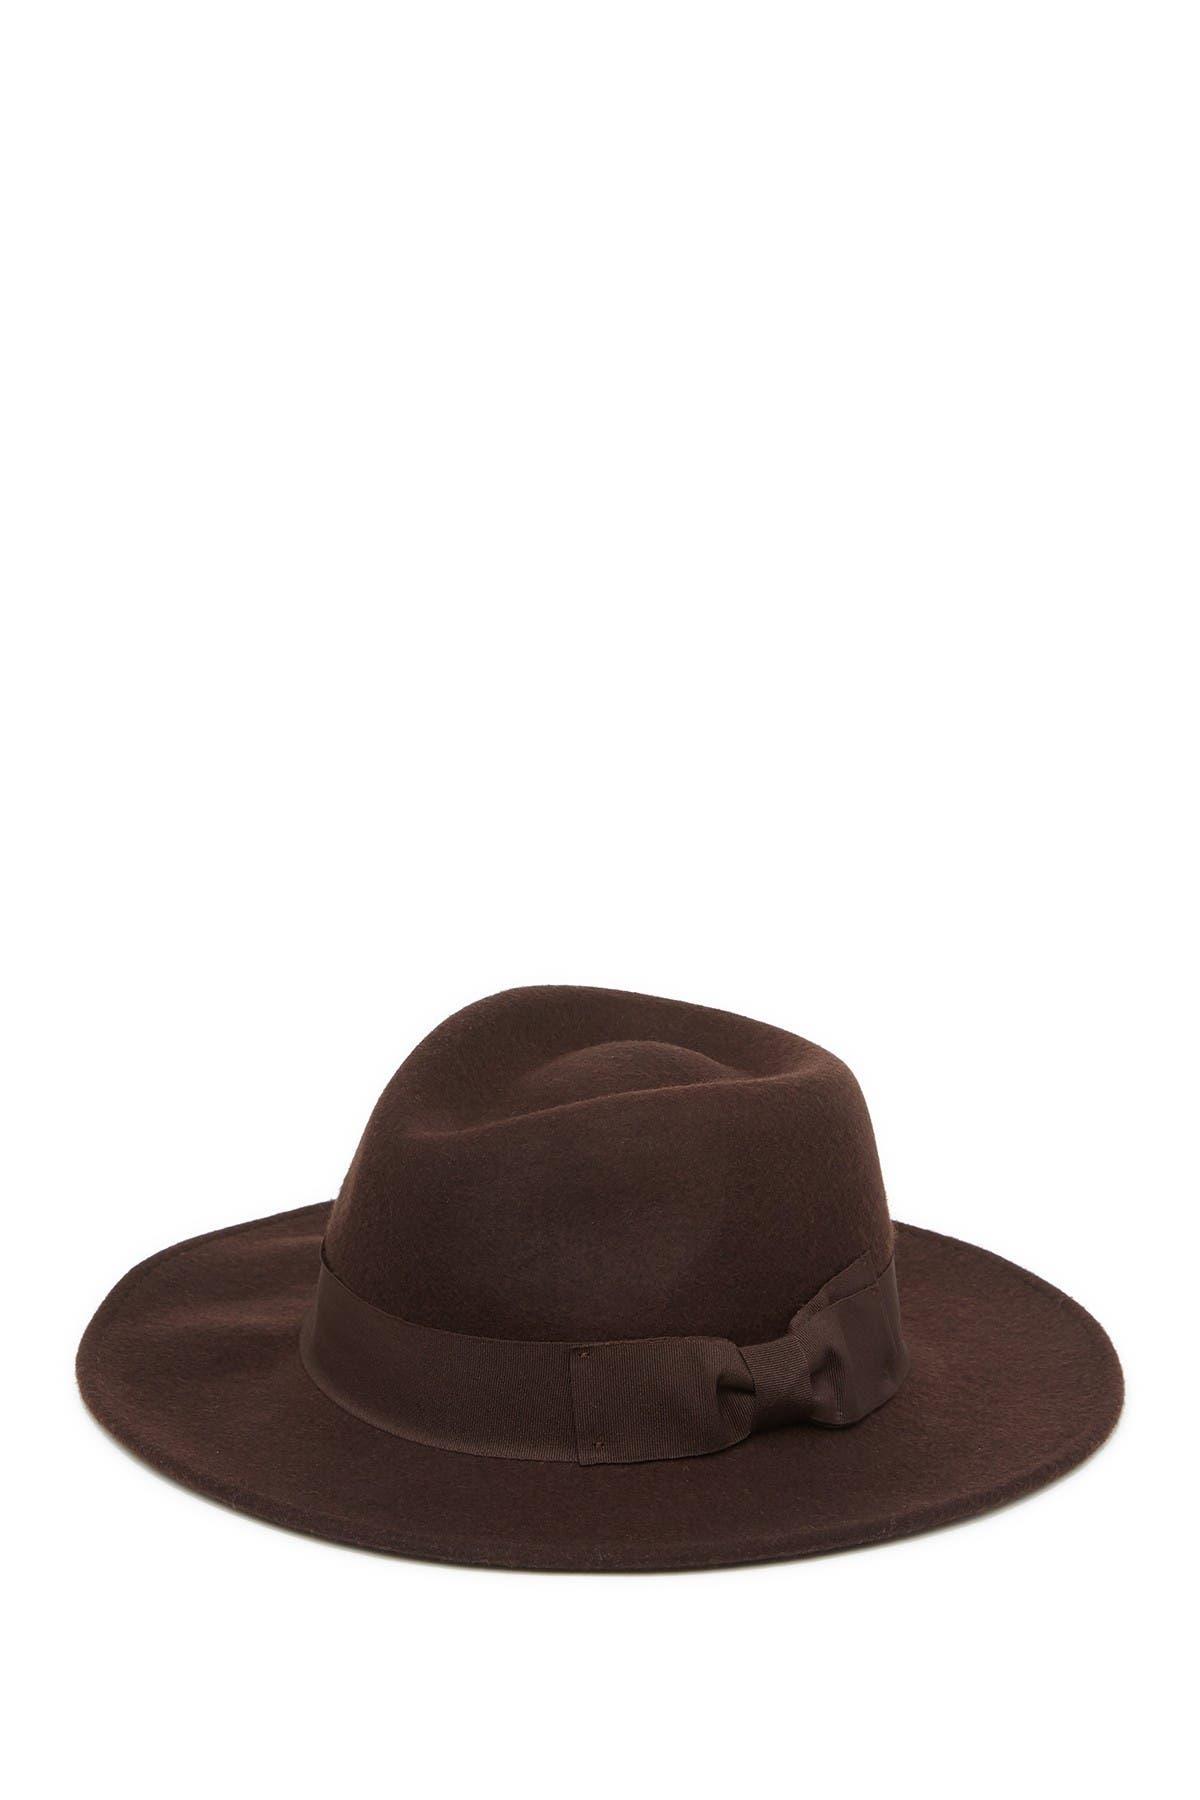 Image of SAN DIEGO HAT Dented Wool Hat